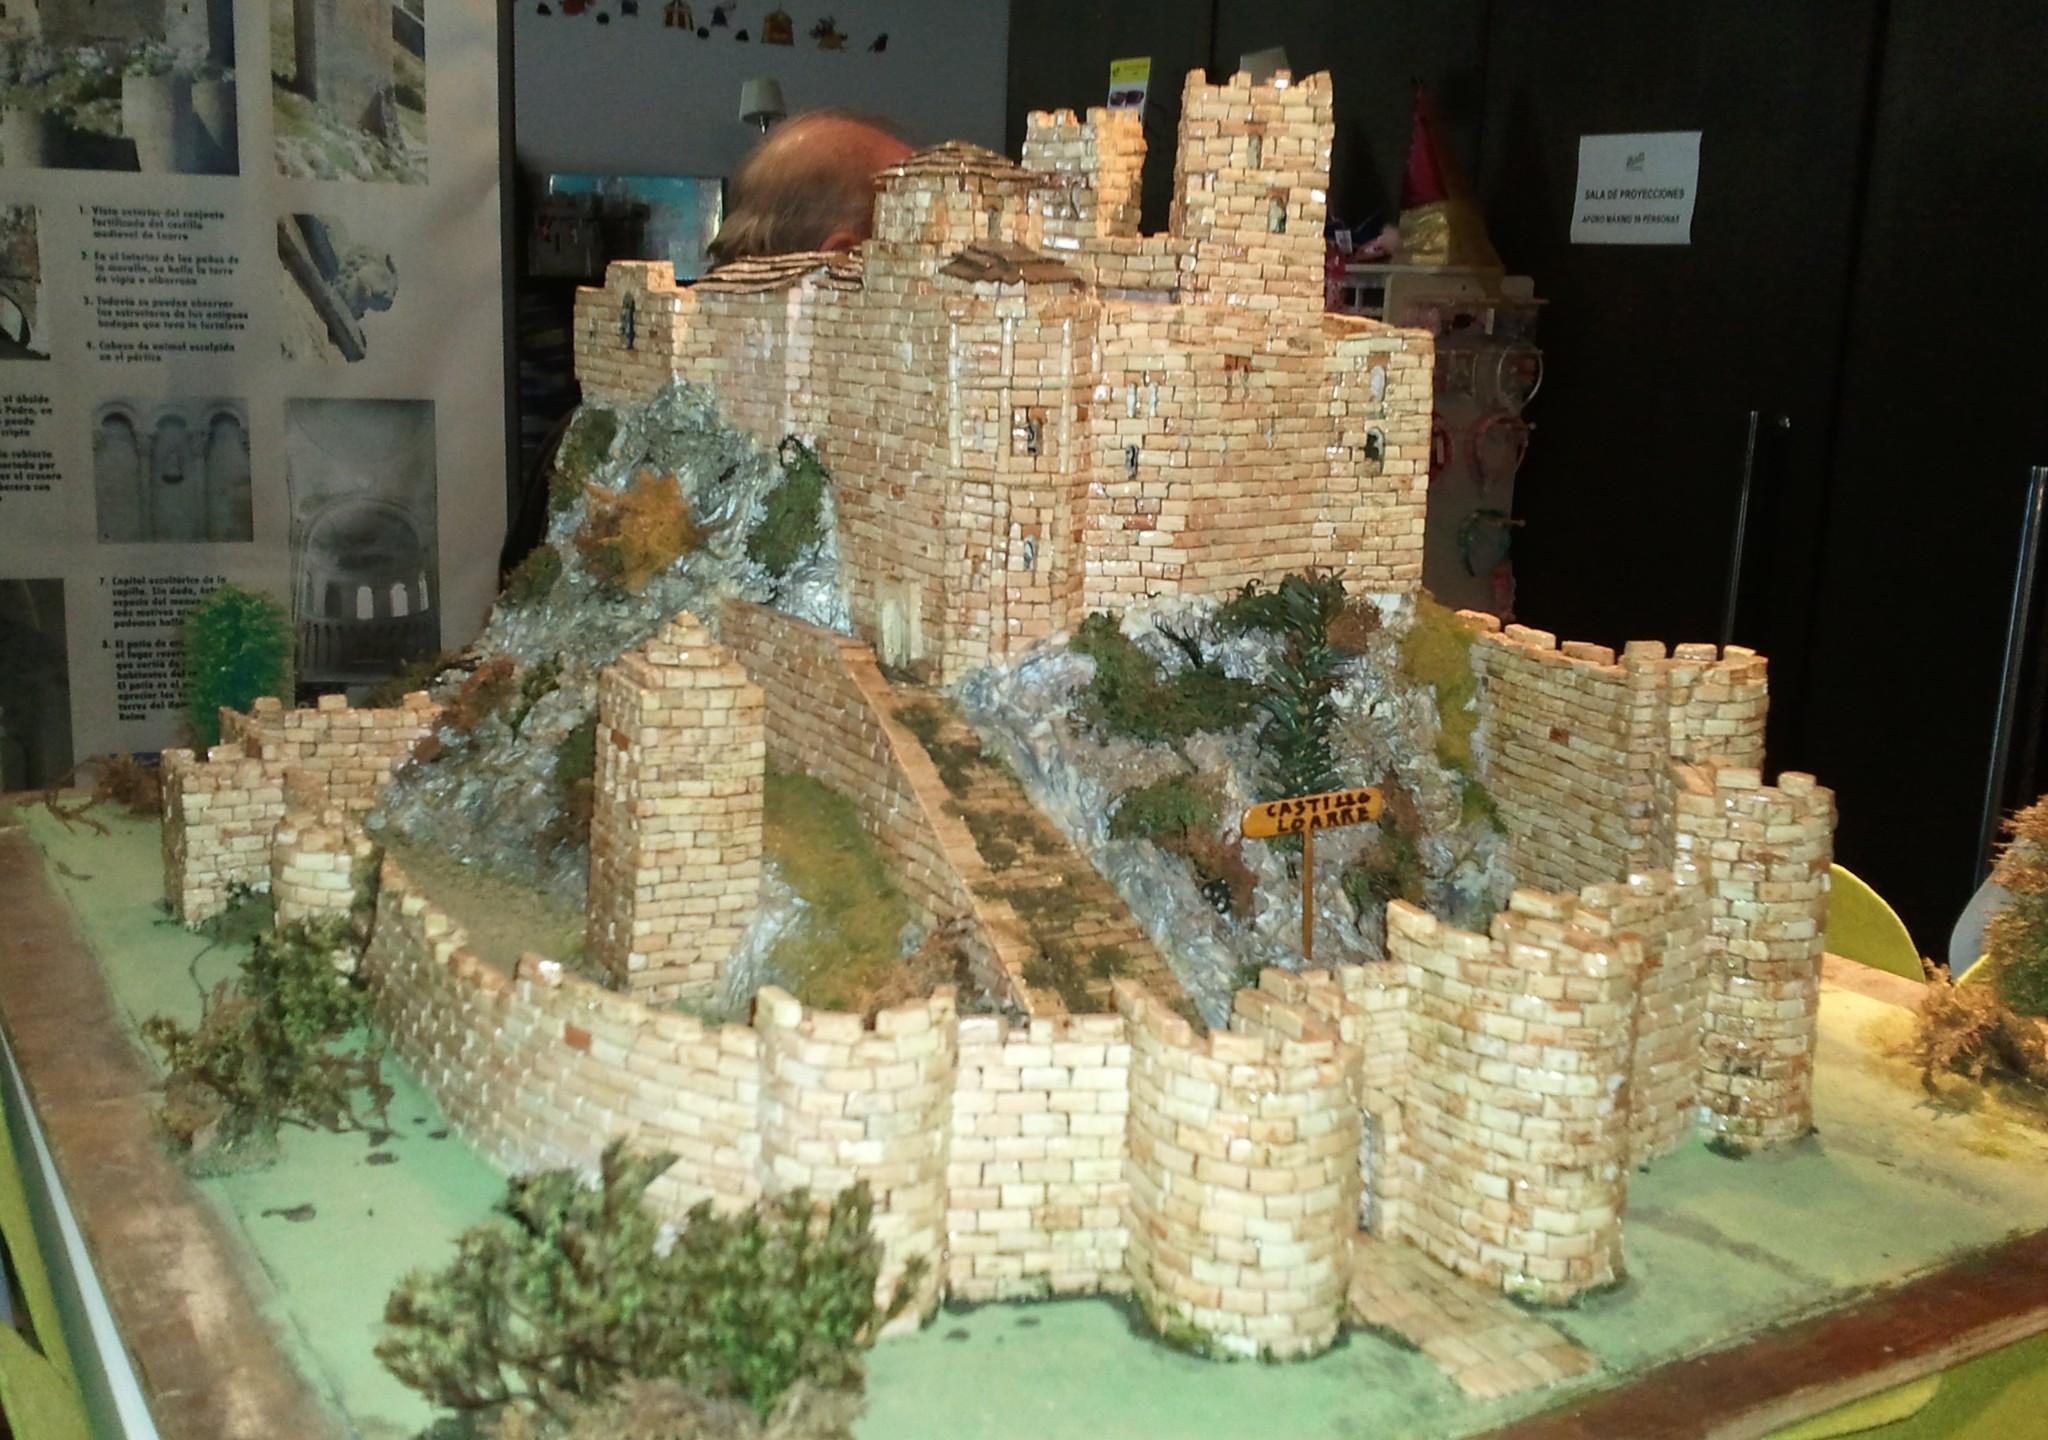 Castillo de Loarre - Maqueta